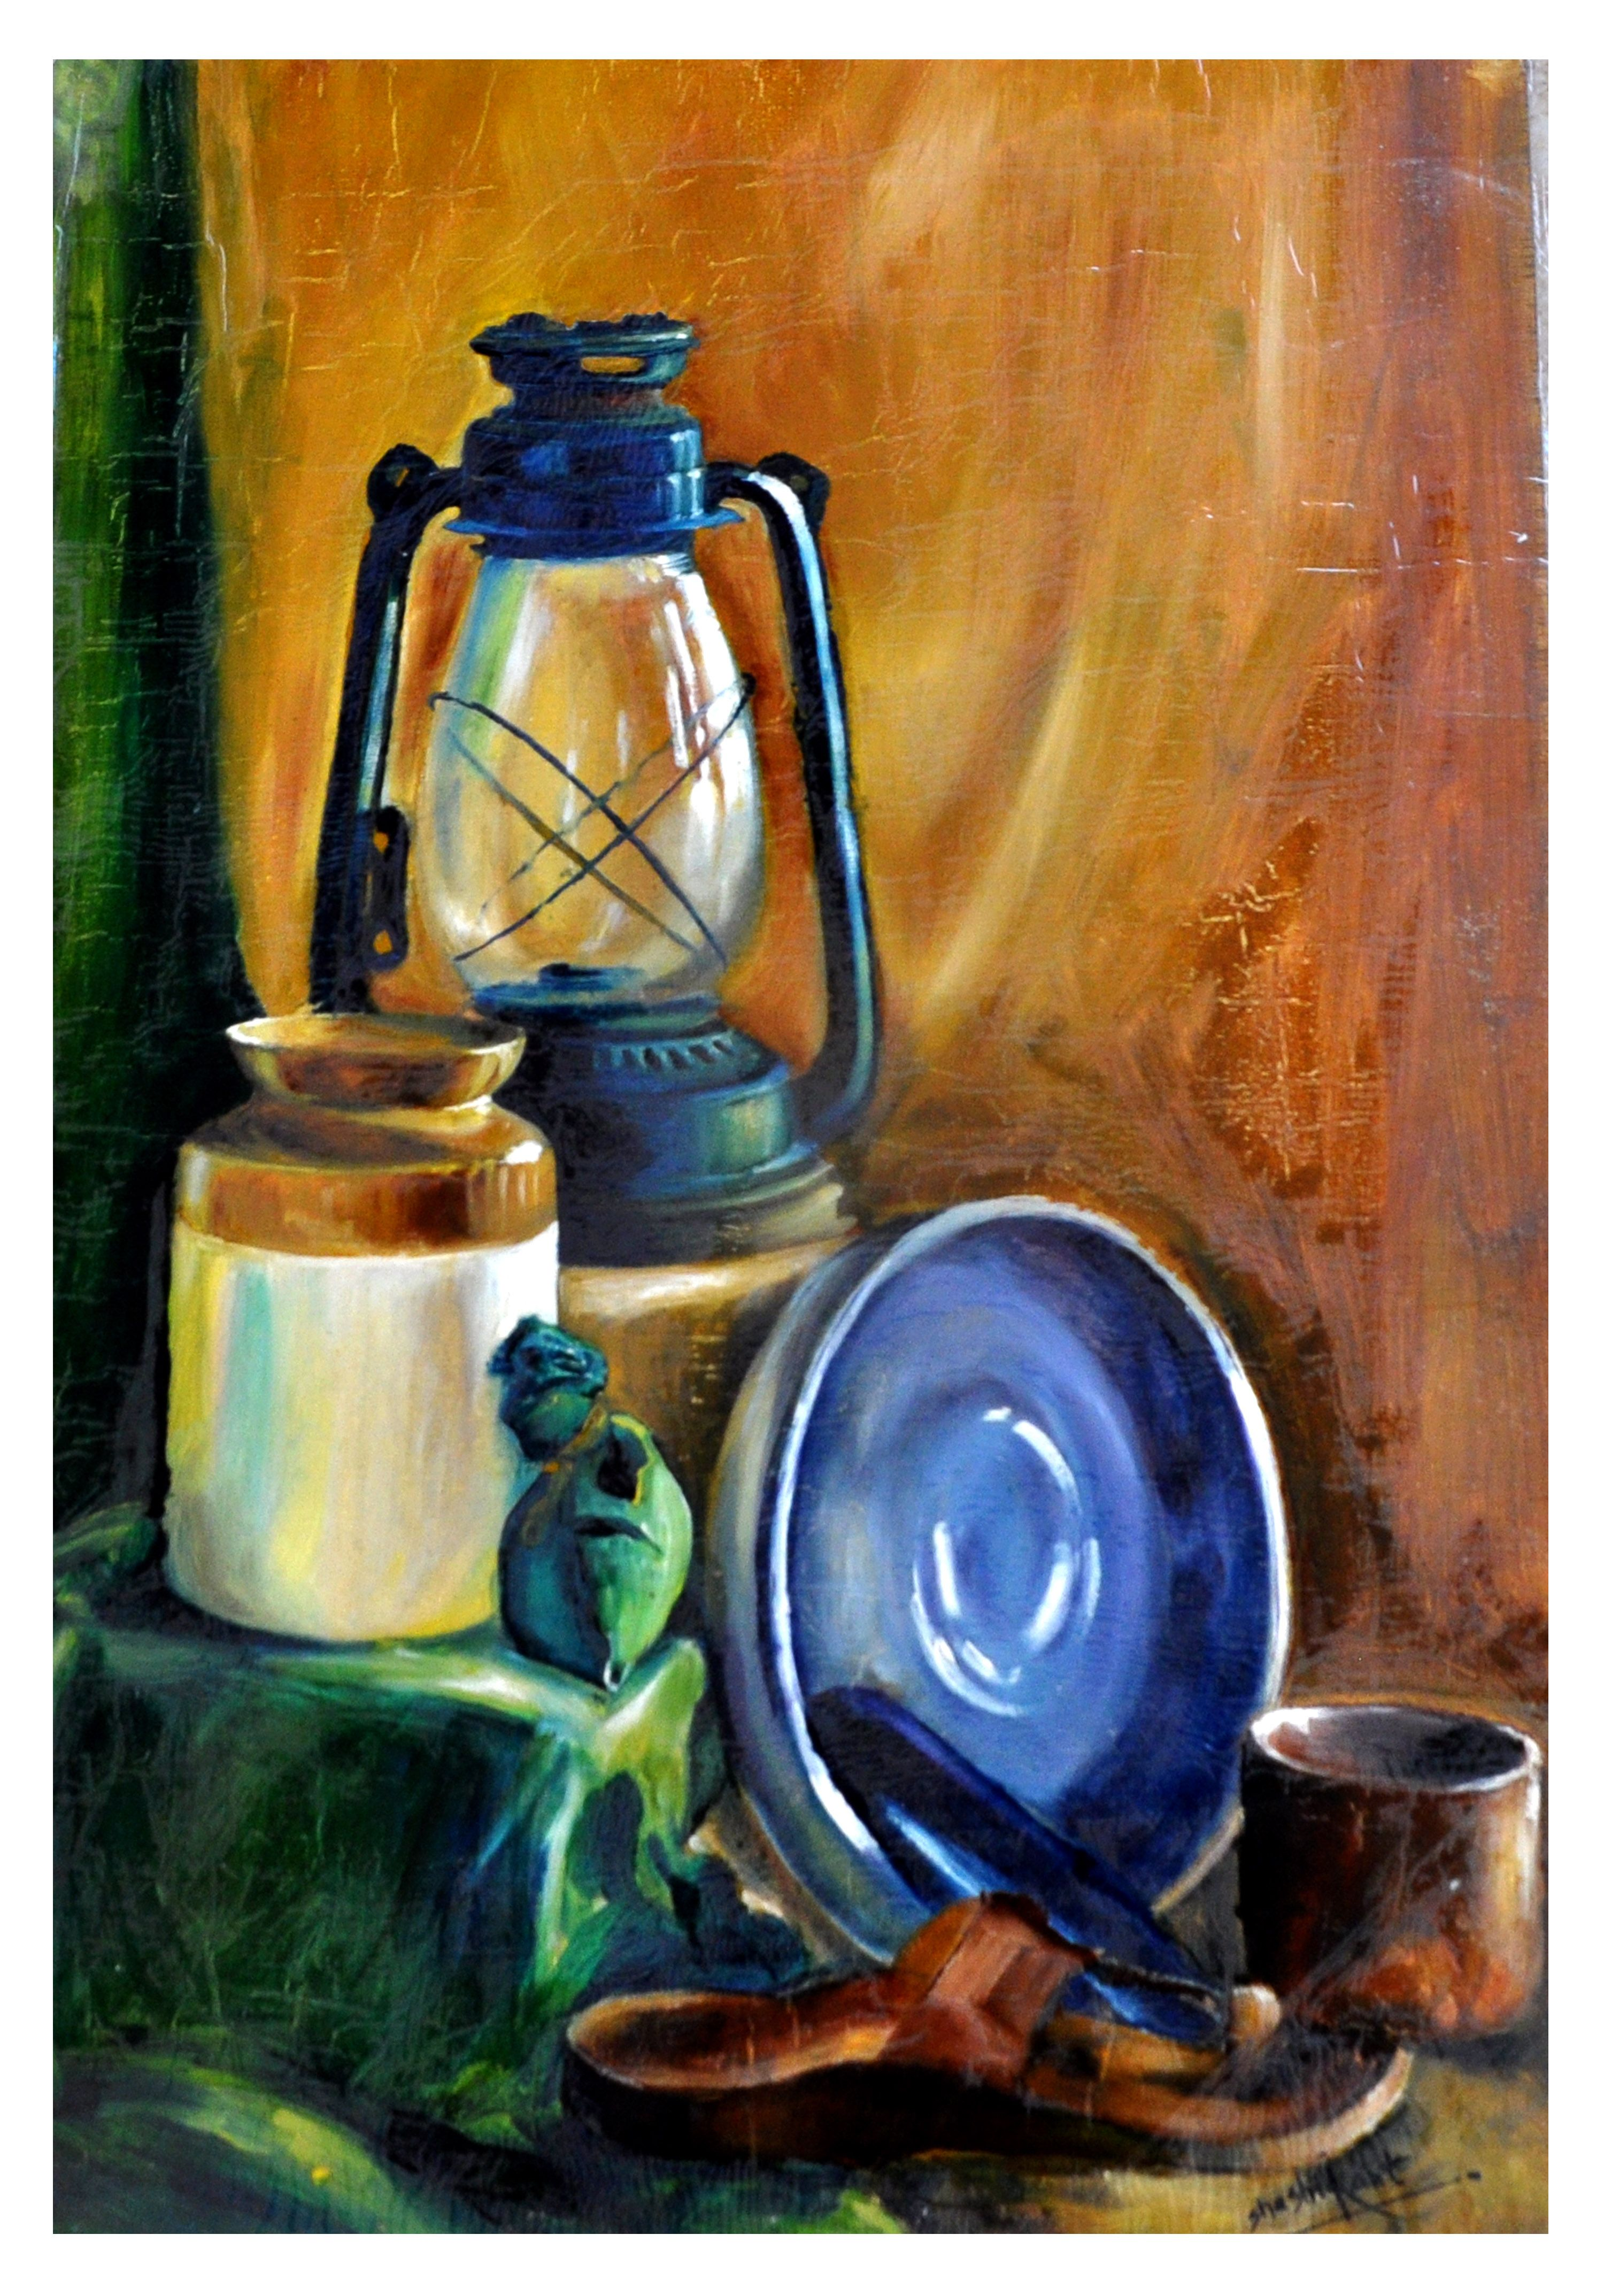 Canvas Wall Art Oil Painting Original Kitchen Wall Decor Rustic latern painting Still Life Painting Original Artwork